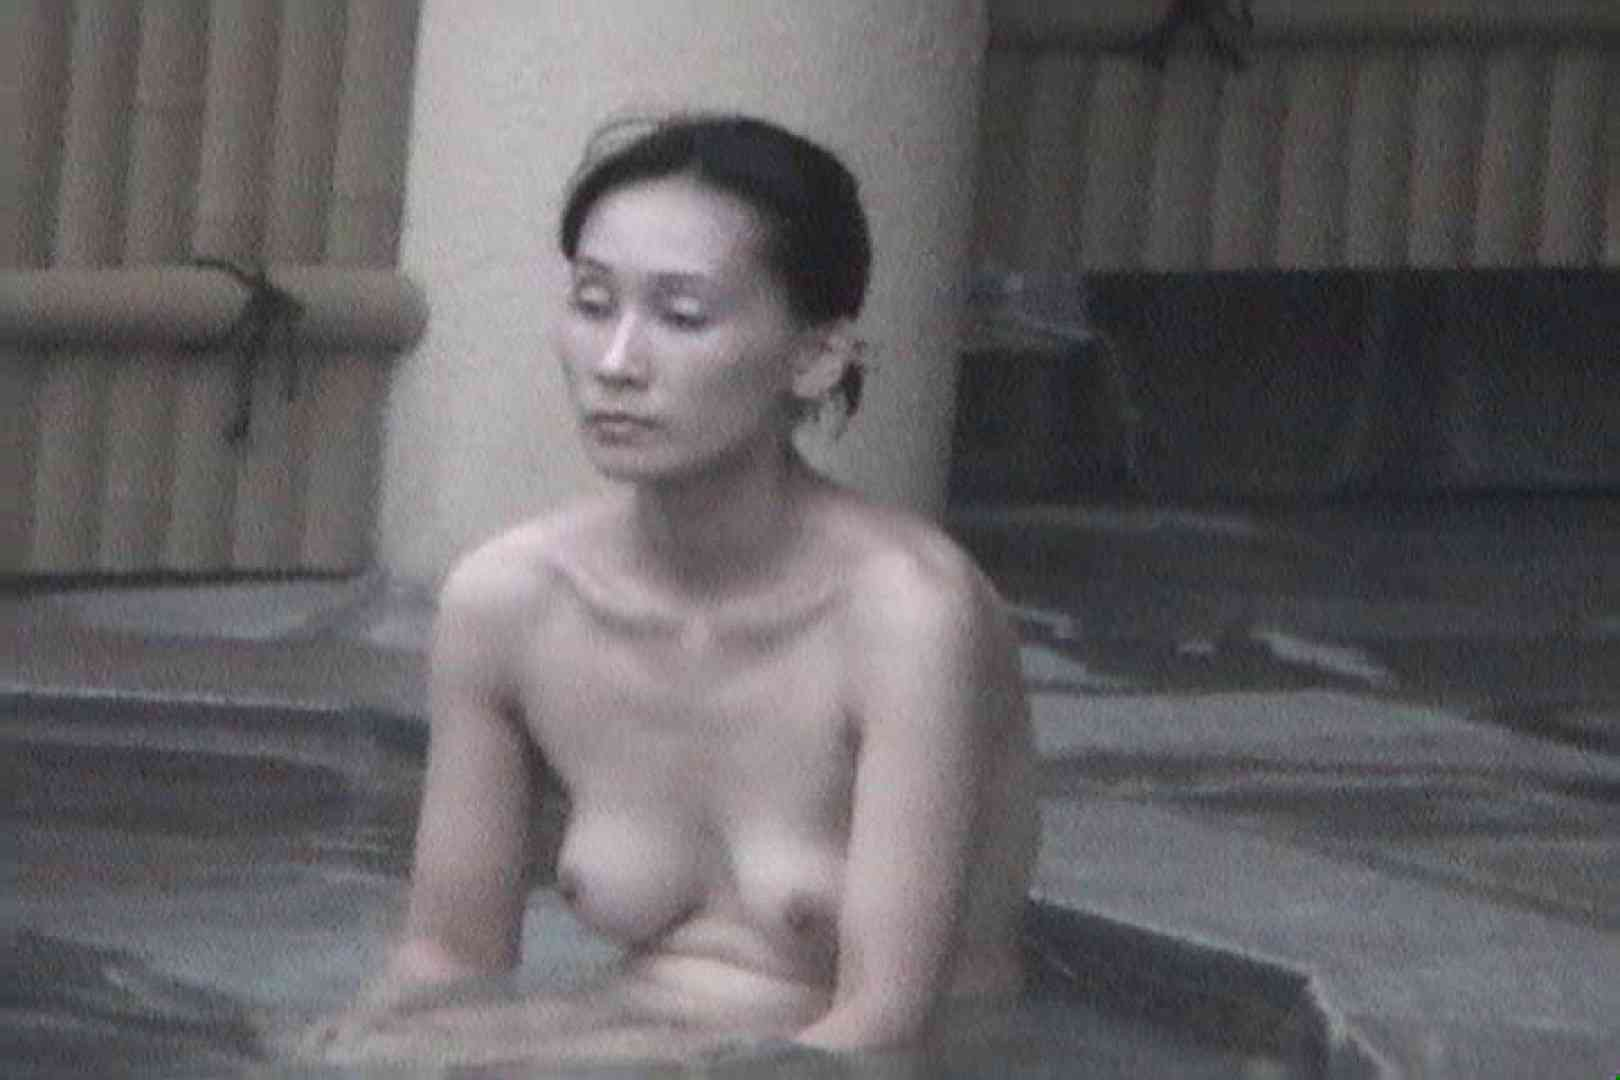 Aquaな露天風呂Vol.557 露天  40連発 12